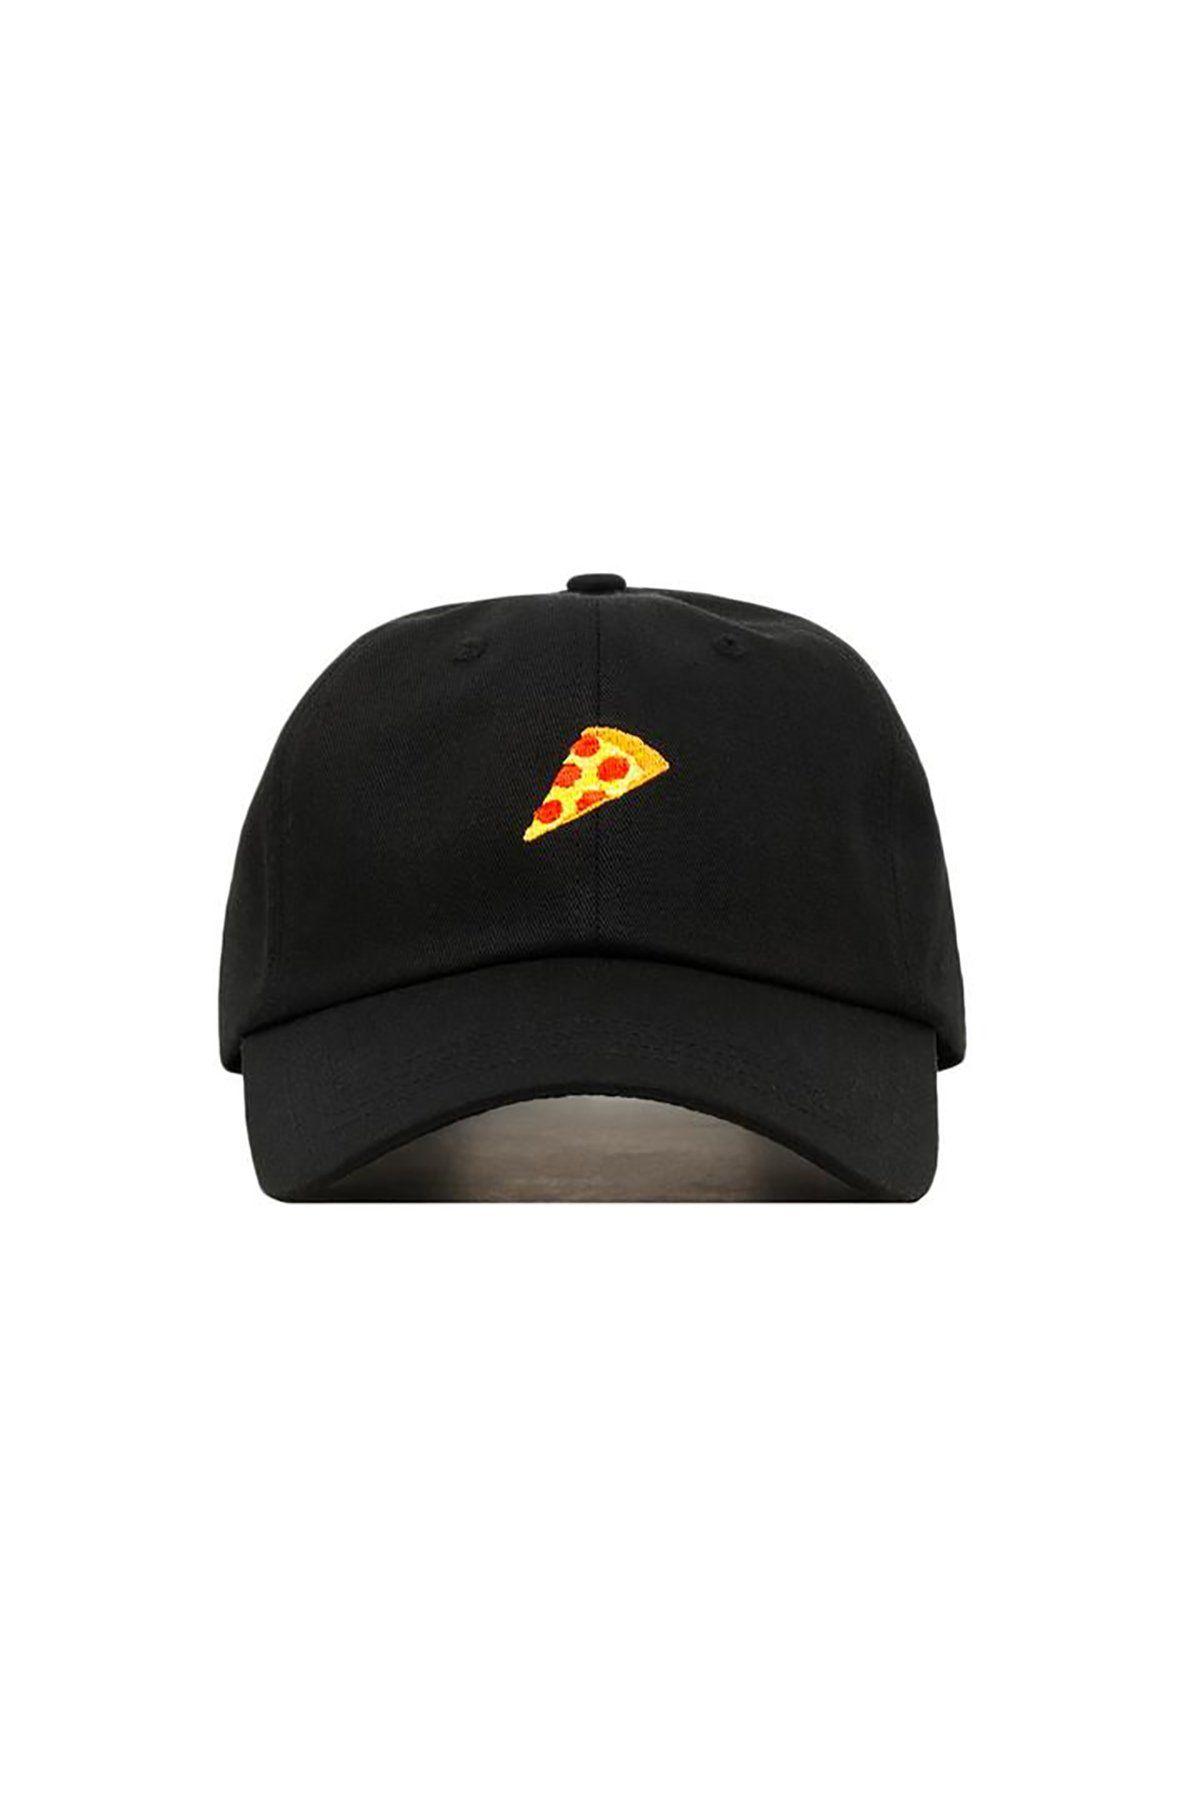 CRSHR Pizza Dad Hat Sombreros Para Papá f0f5c3e4f32